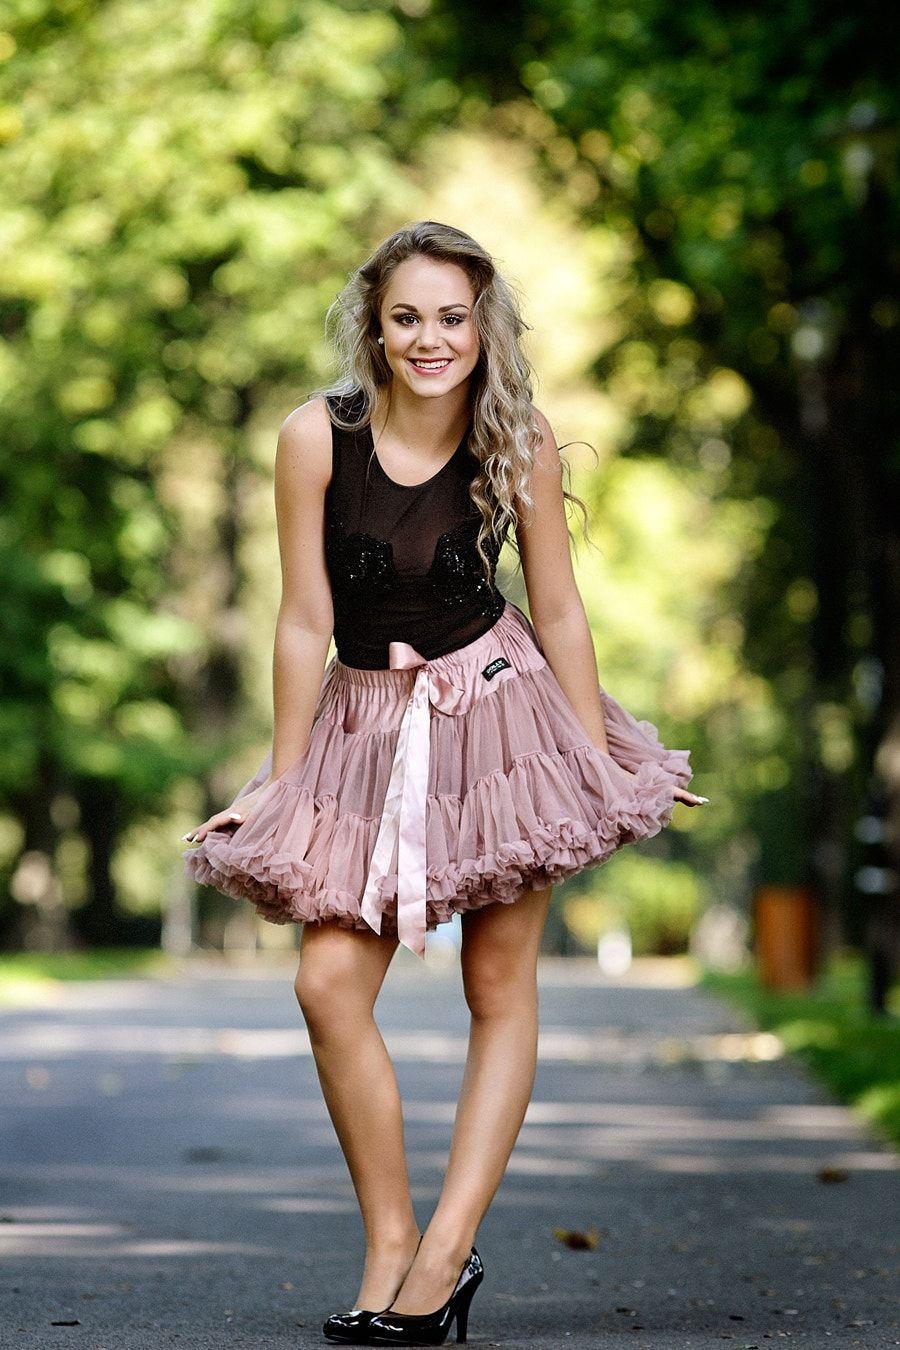 DJH Girl Fashion, Robes Romantiques, Dresses, Women s Work Fashion, Curve  Dresses, c1eeba392a9e